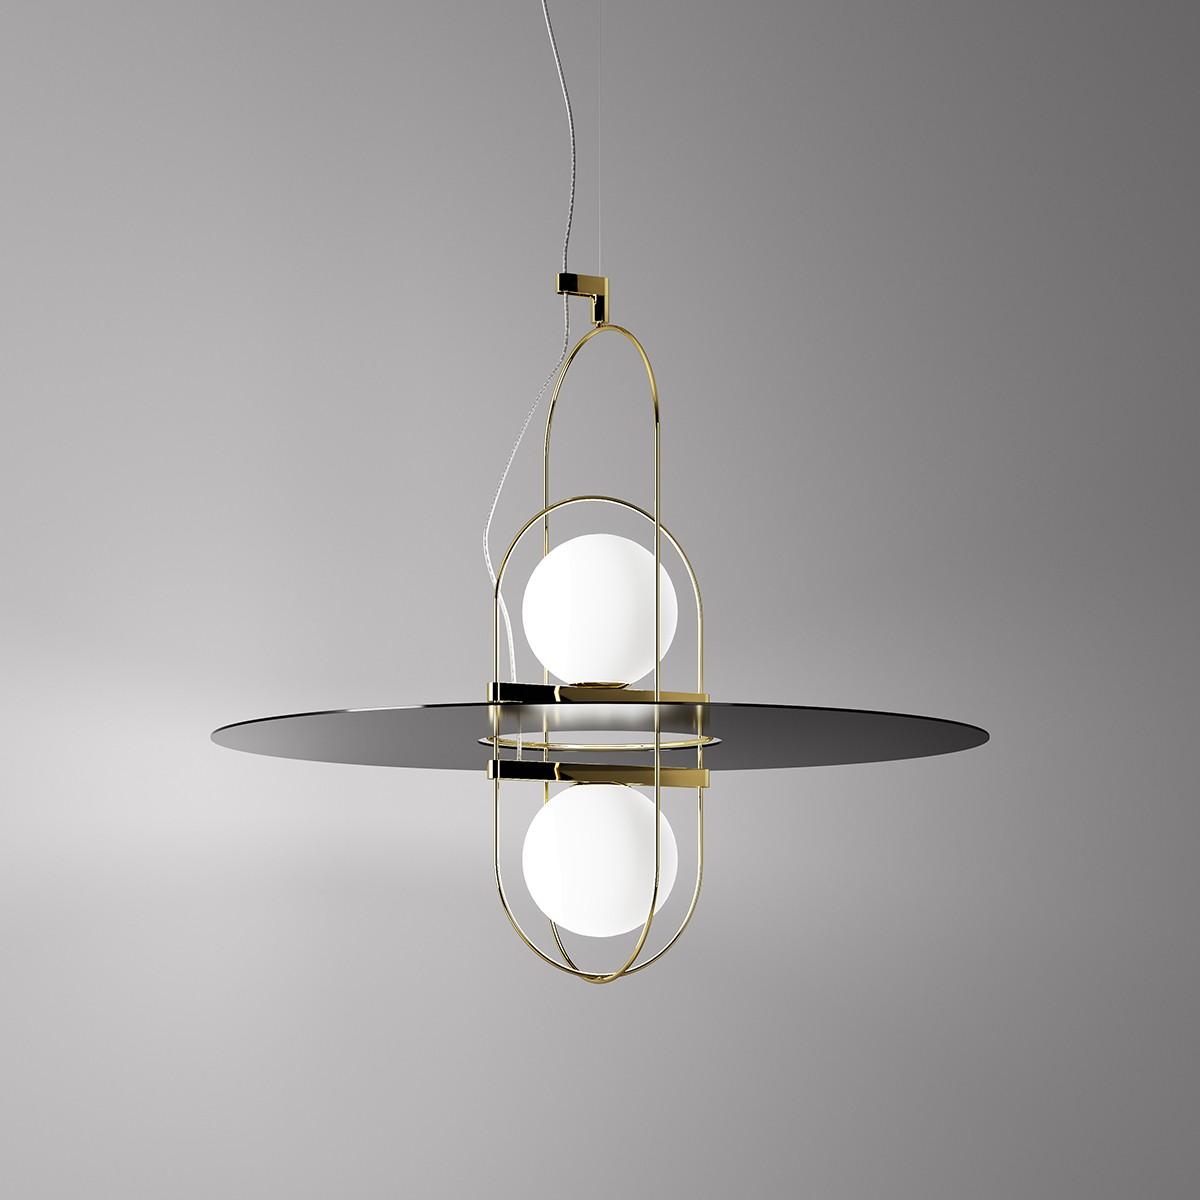 Fontana Arte Setareh 2 LED Pendelleuchte, 2-flg., Gold / schwarz